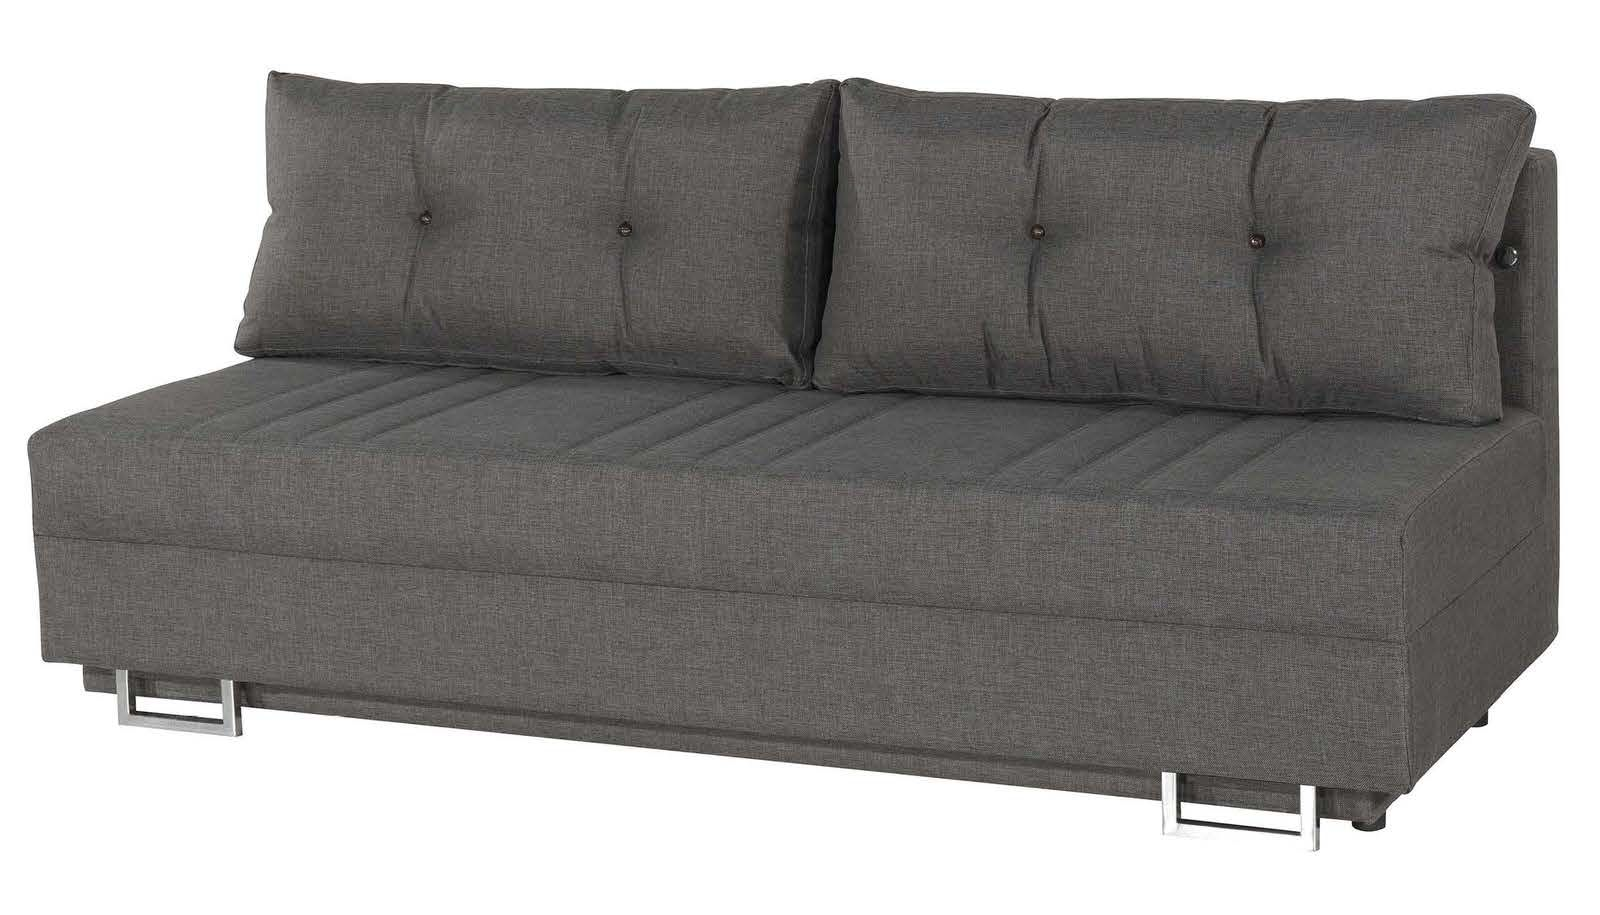 Vegas Futon Sectional Sofa Bed Queen Sleeper With Storage Retro Sydney Bruin Blog